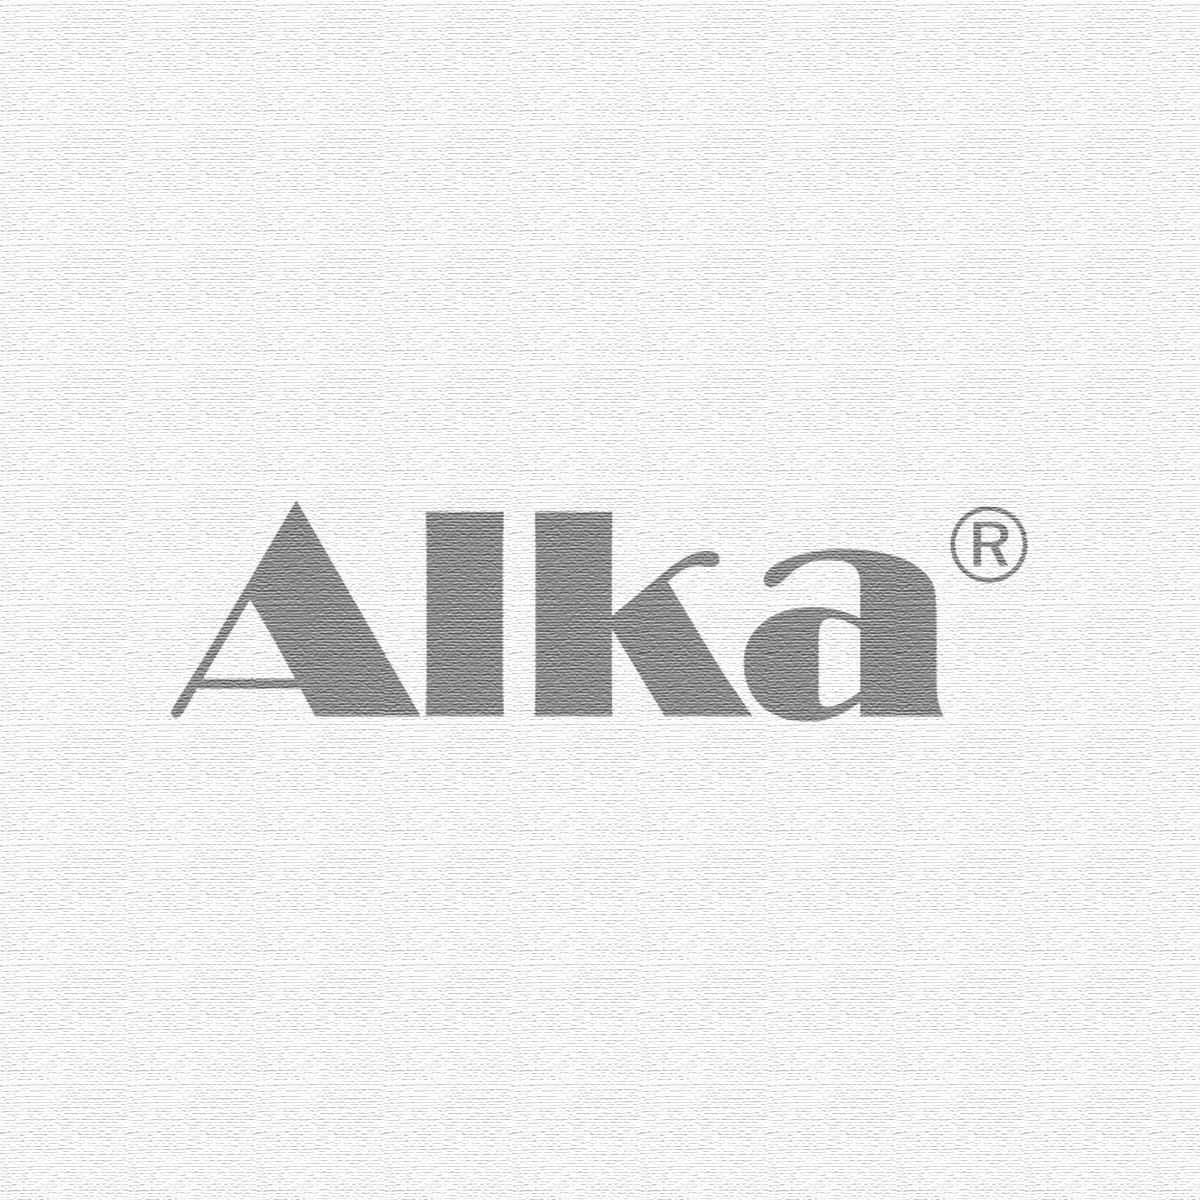 Alka® Starterspakket Calcium - NL - pakket - AlkaVitae